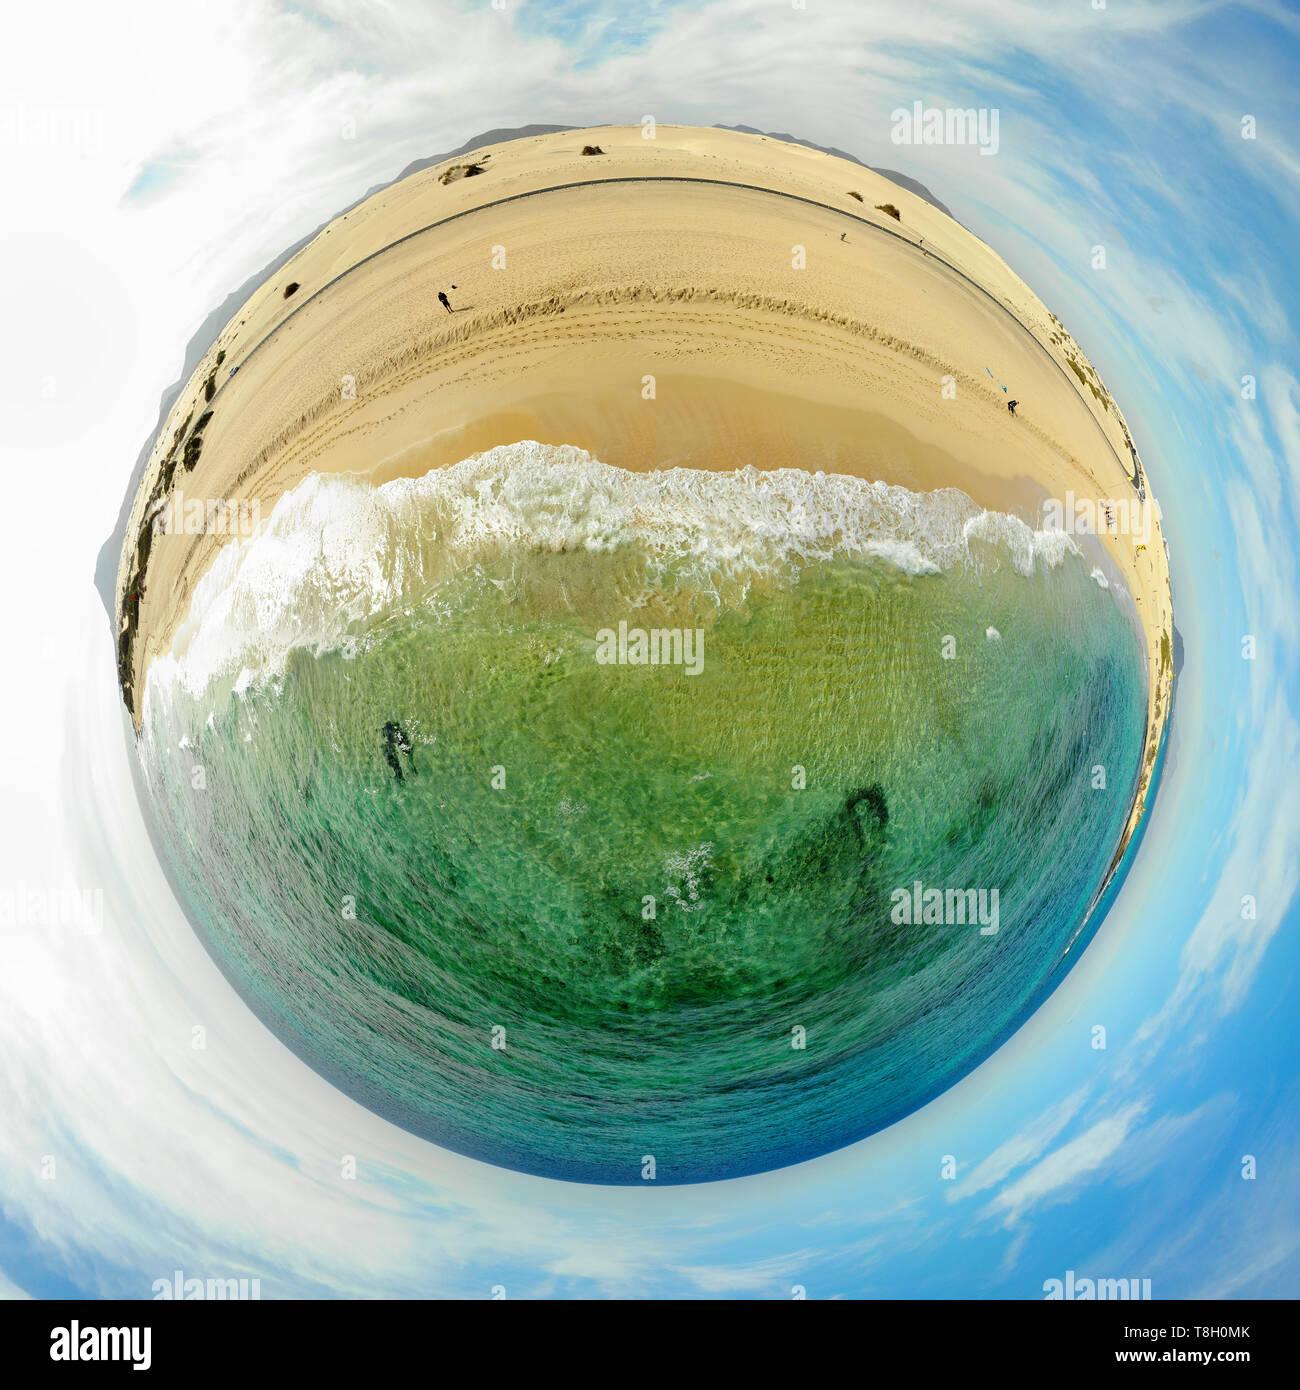 full circle-Panorama: Luftbild: Sandduenen von Corralejo, Fuerteventura, Kanarische Inseln, Spanien/ aerial view: sand dunes of Corralejo,Fuerteventur - Stock Image